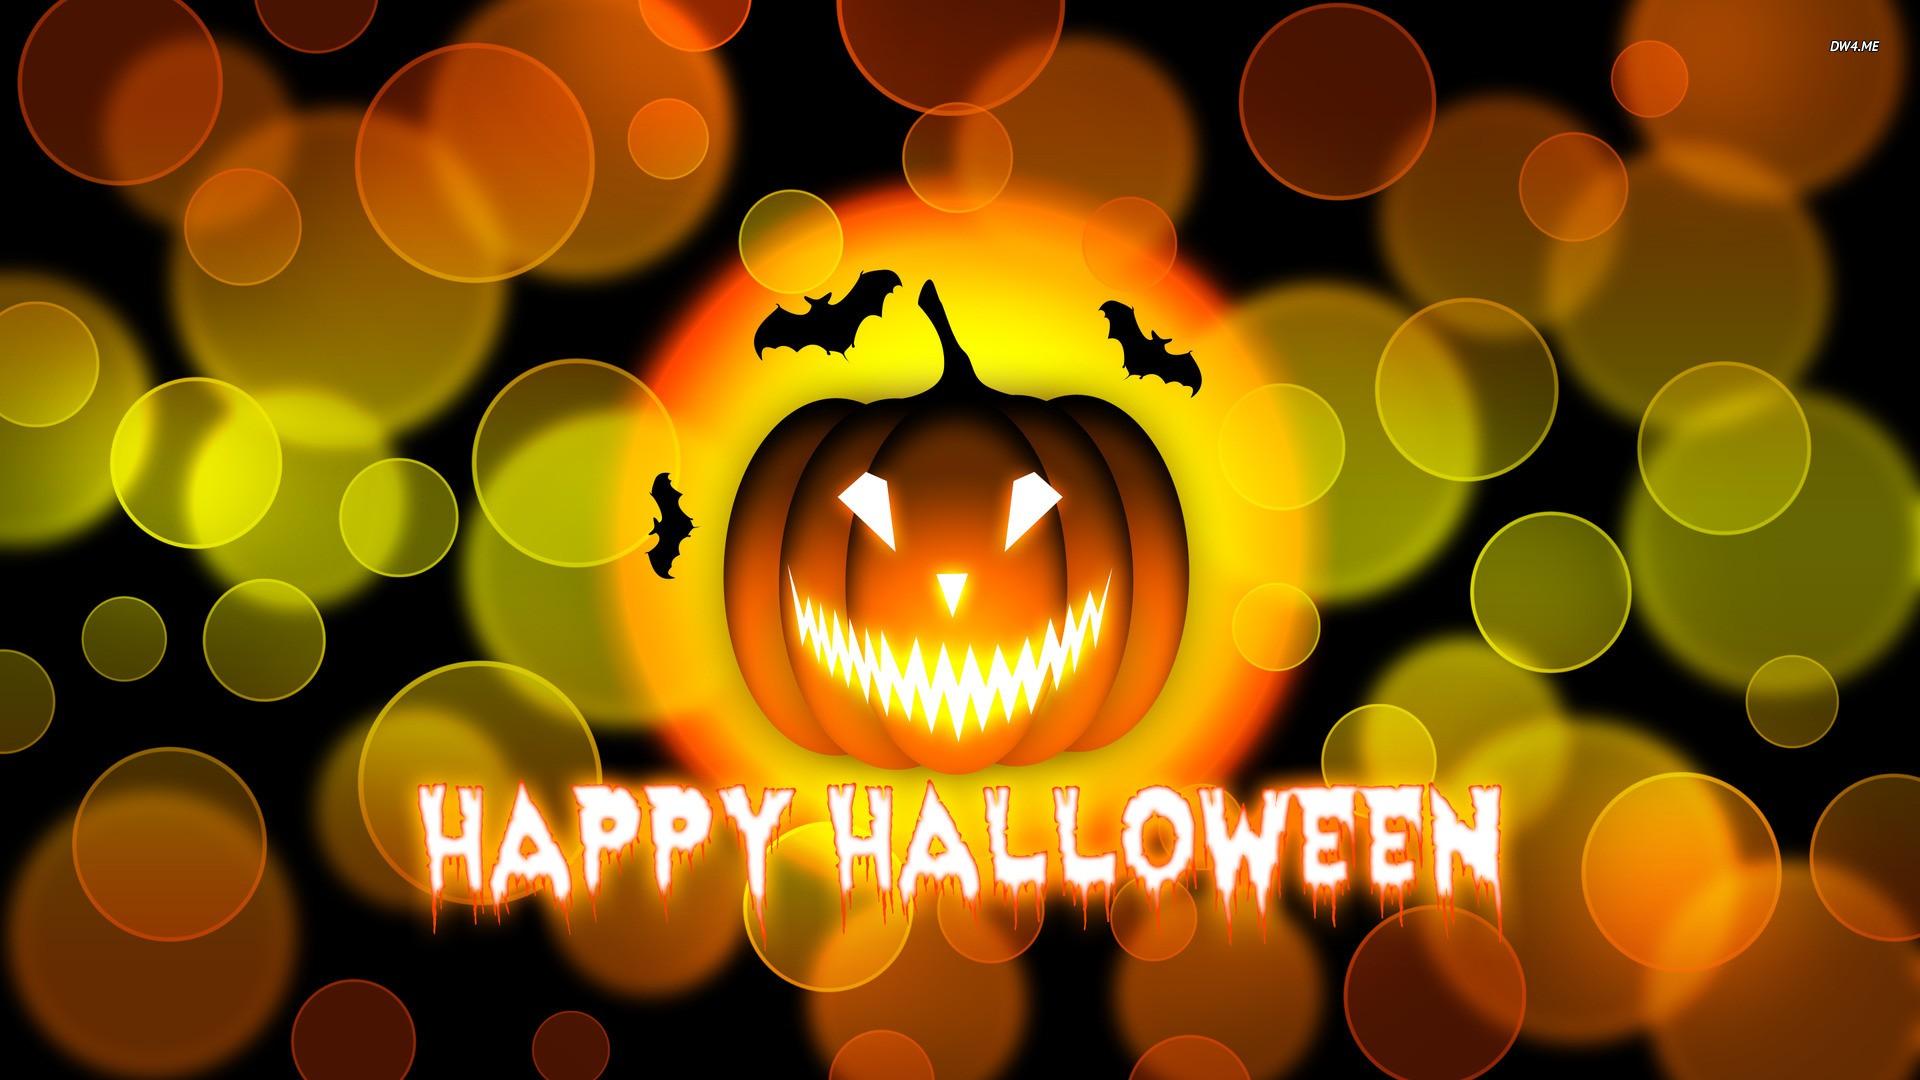 Cute Christmas Owl Desktop Wallpaper Happy Halloween Wallpaper 183 ① Download Free Stunning Full